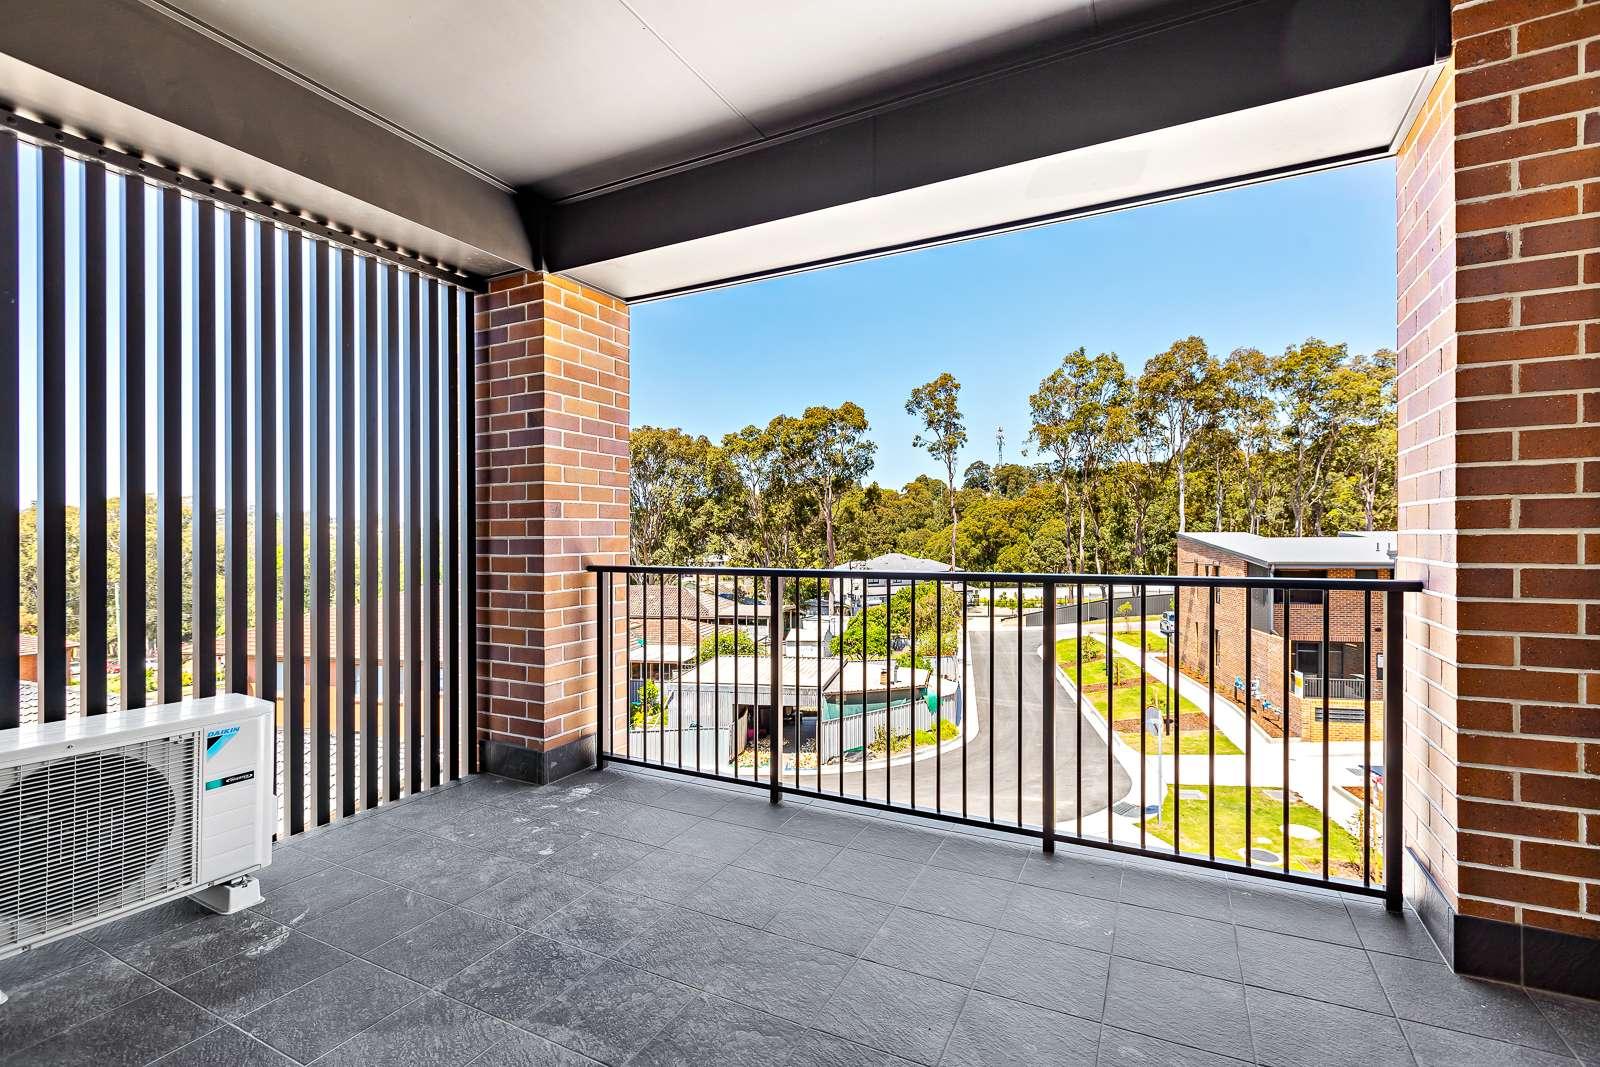 101/2 Avena Path, Waratah West, NSW 2298